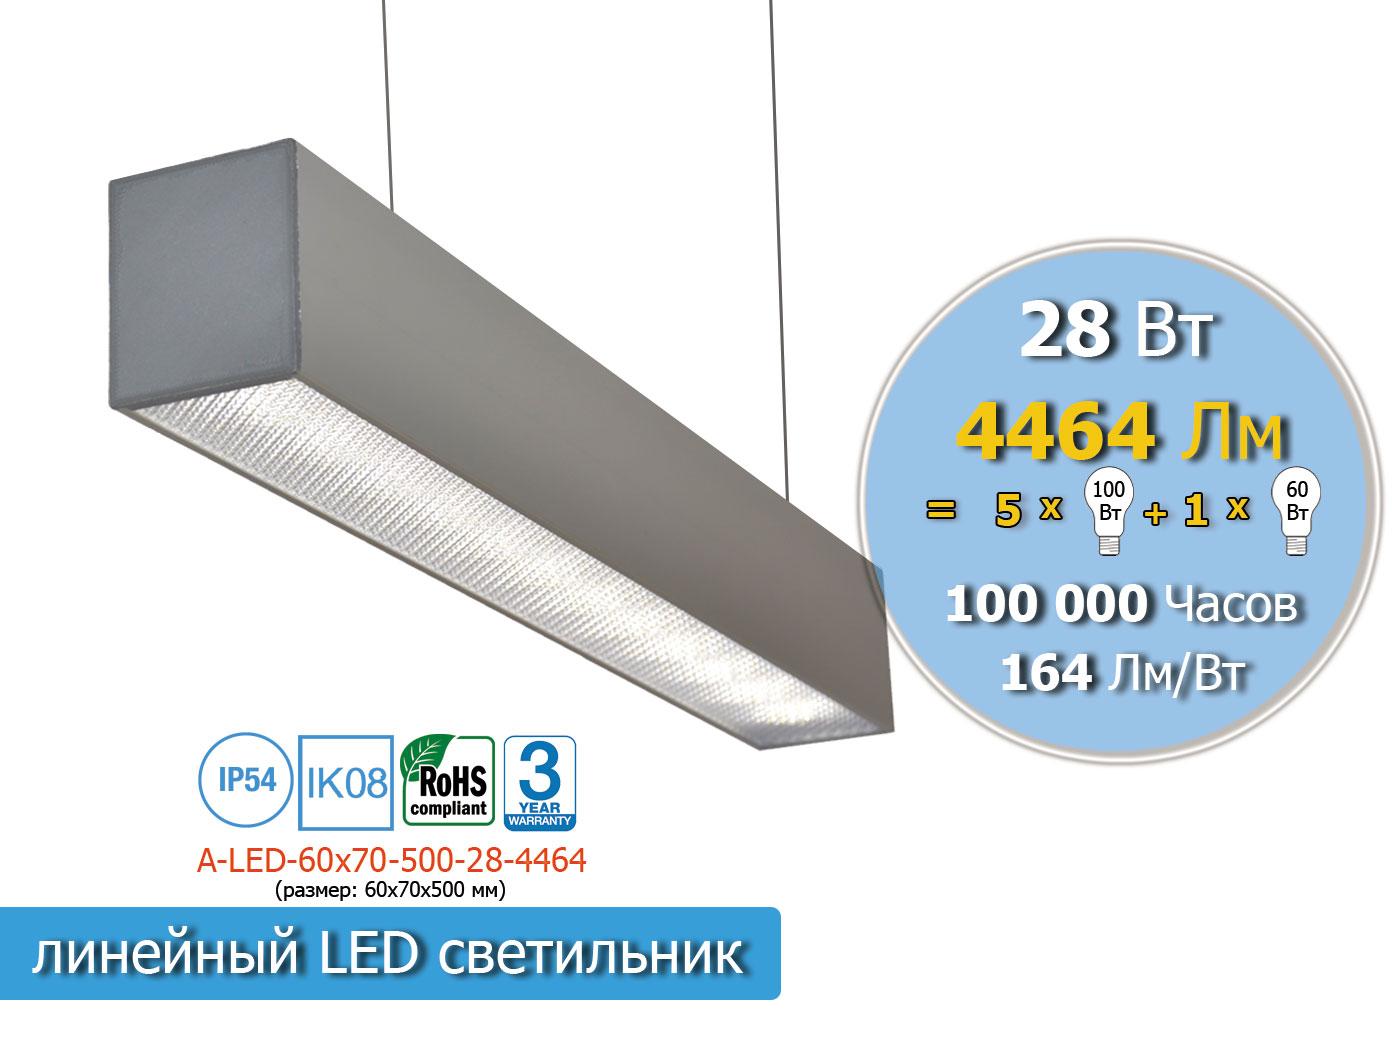 A-LED-60х70-500-28-4464